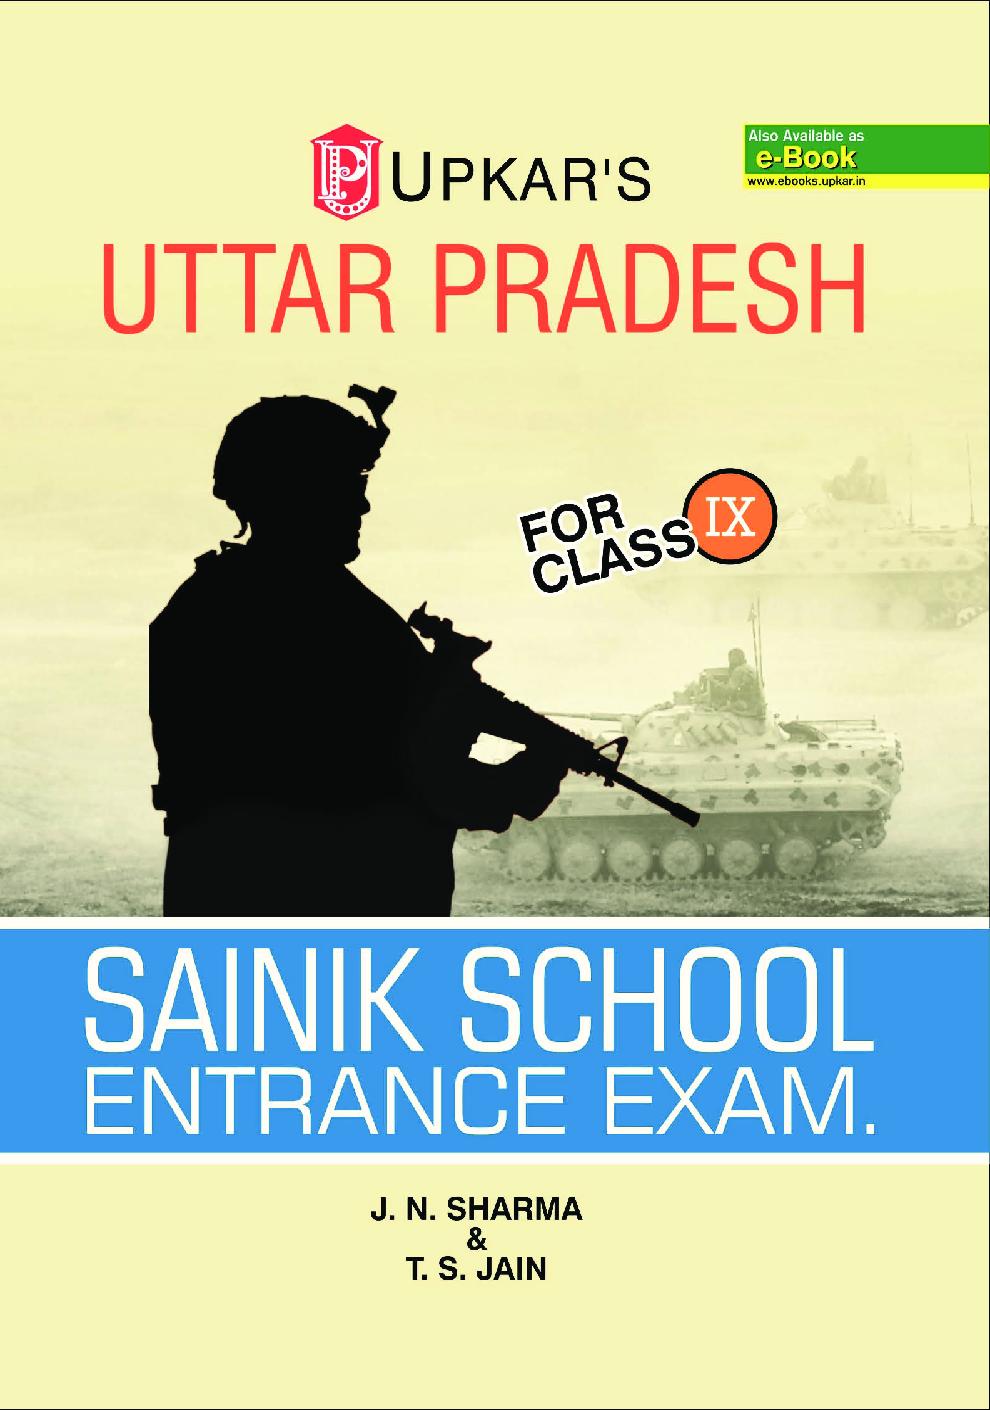 Uttar Pradesh Sainik School Entrance Exam For Class - IX - Page 1